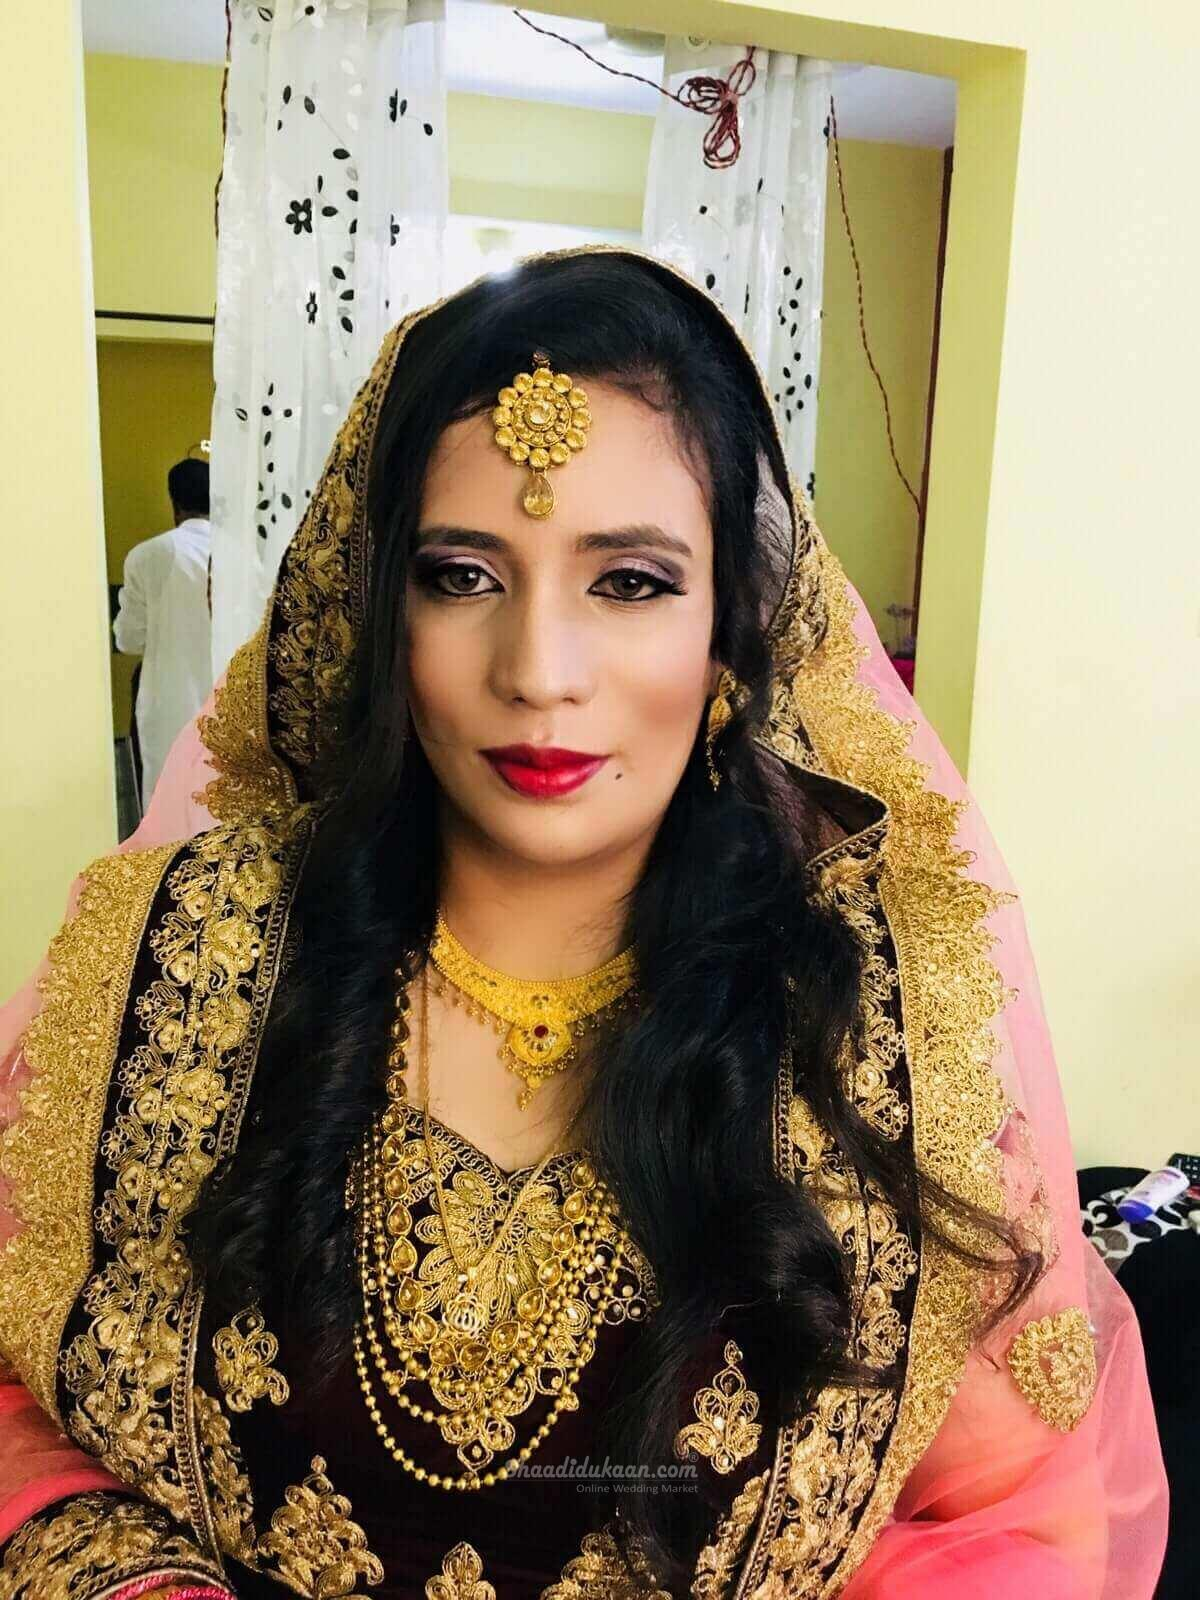 Krithiskare Makeup Studio